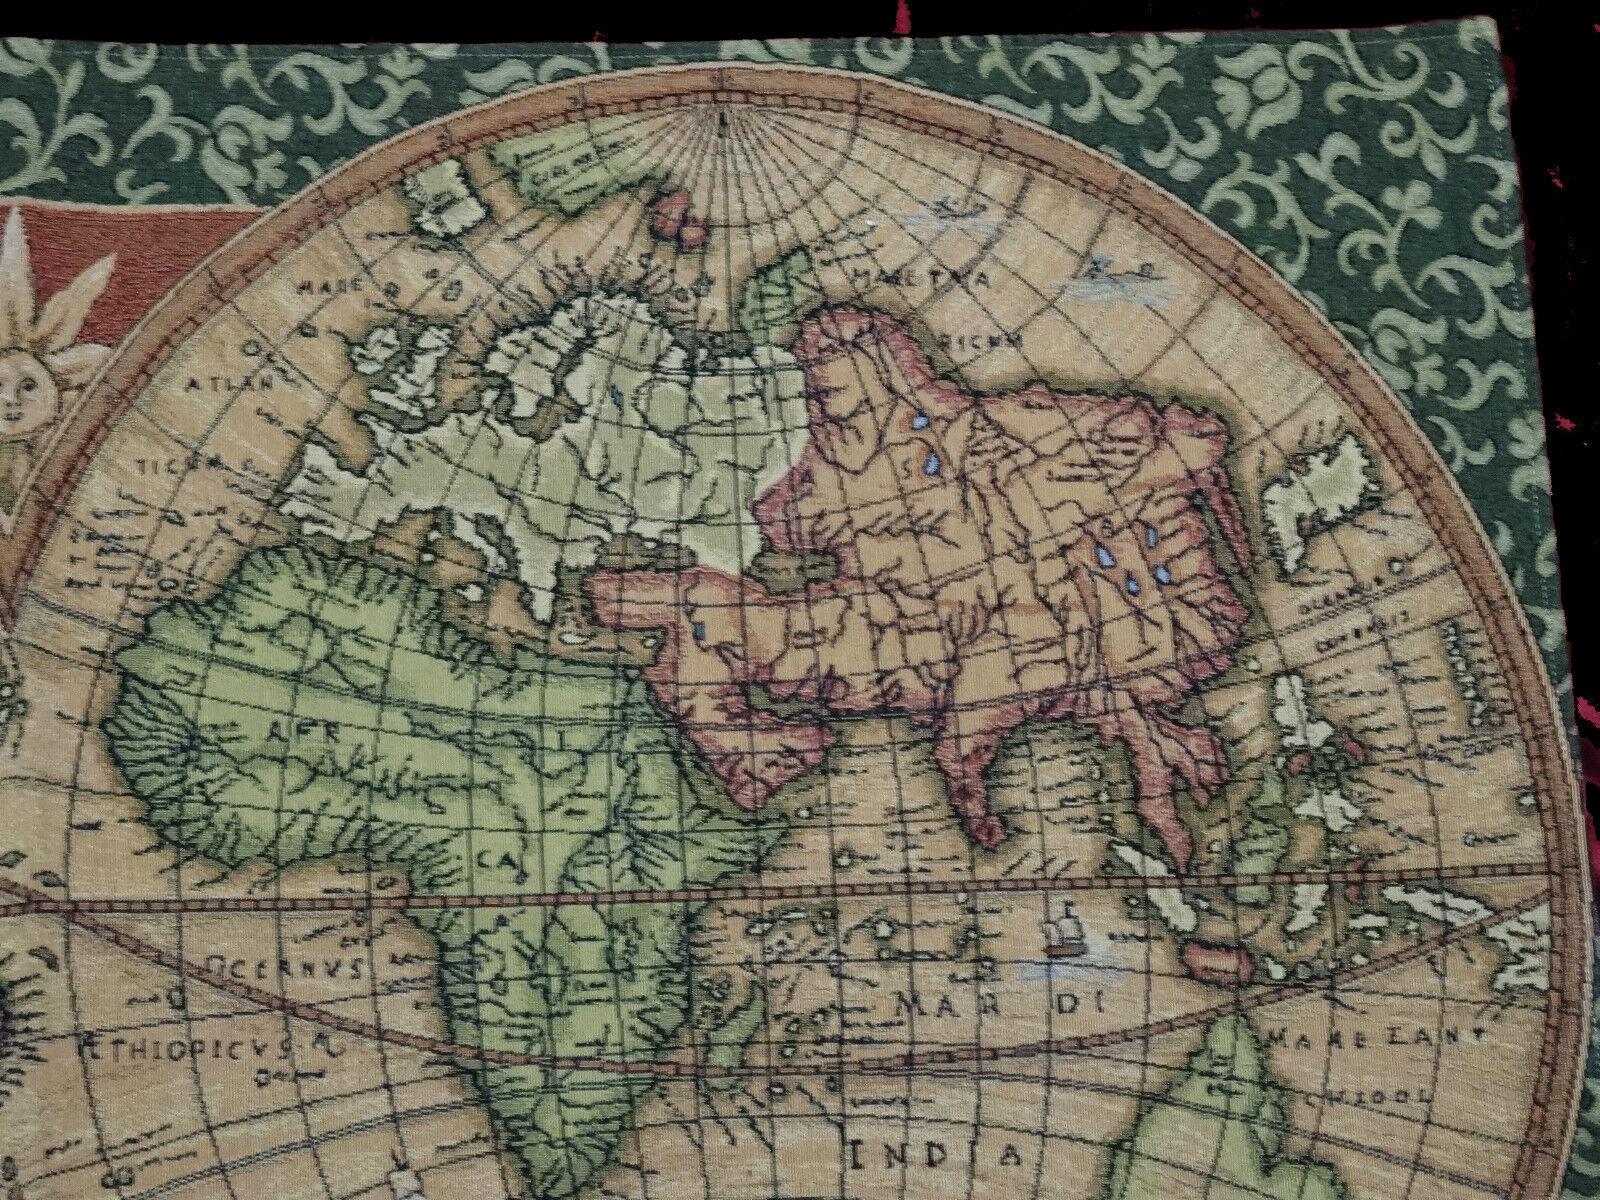 Wandteppich Gobelin  OLD MAP WELTKARTE ANTIK DESIGN GRÜN TAPESTERY 116 x 68